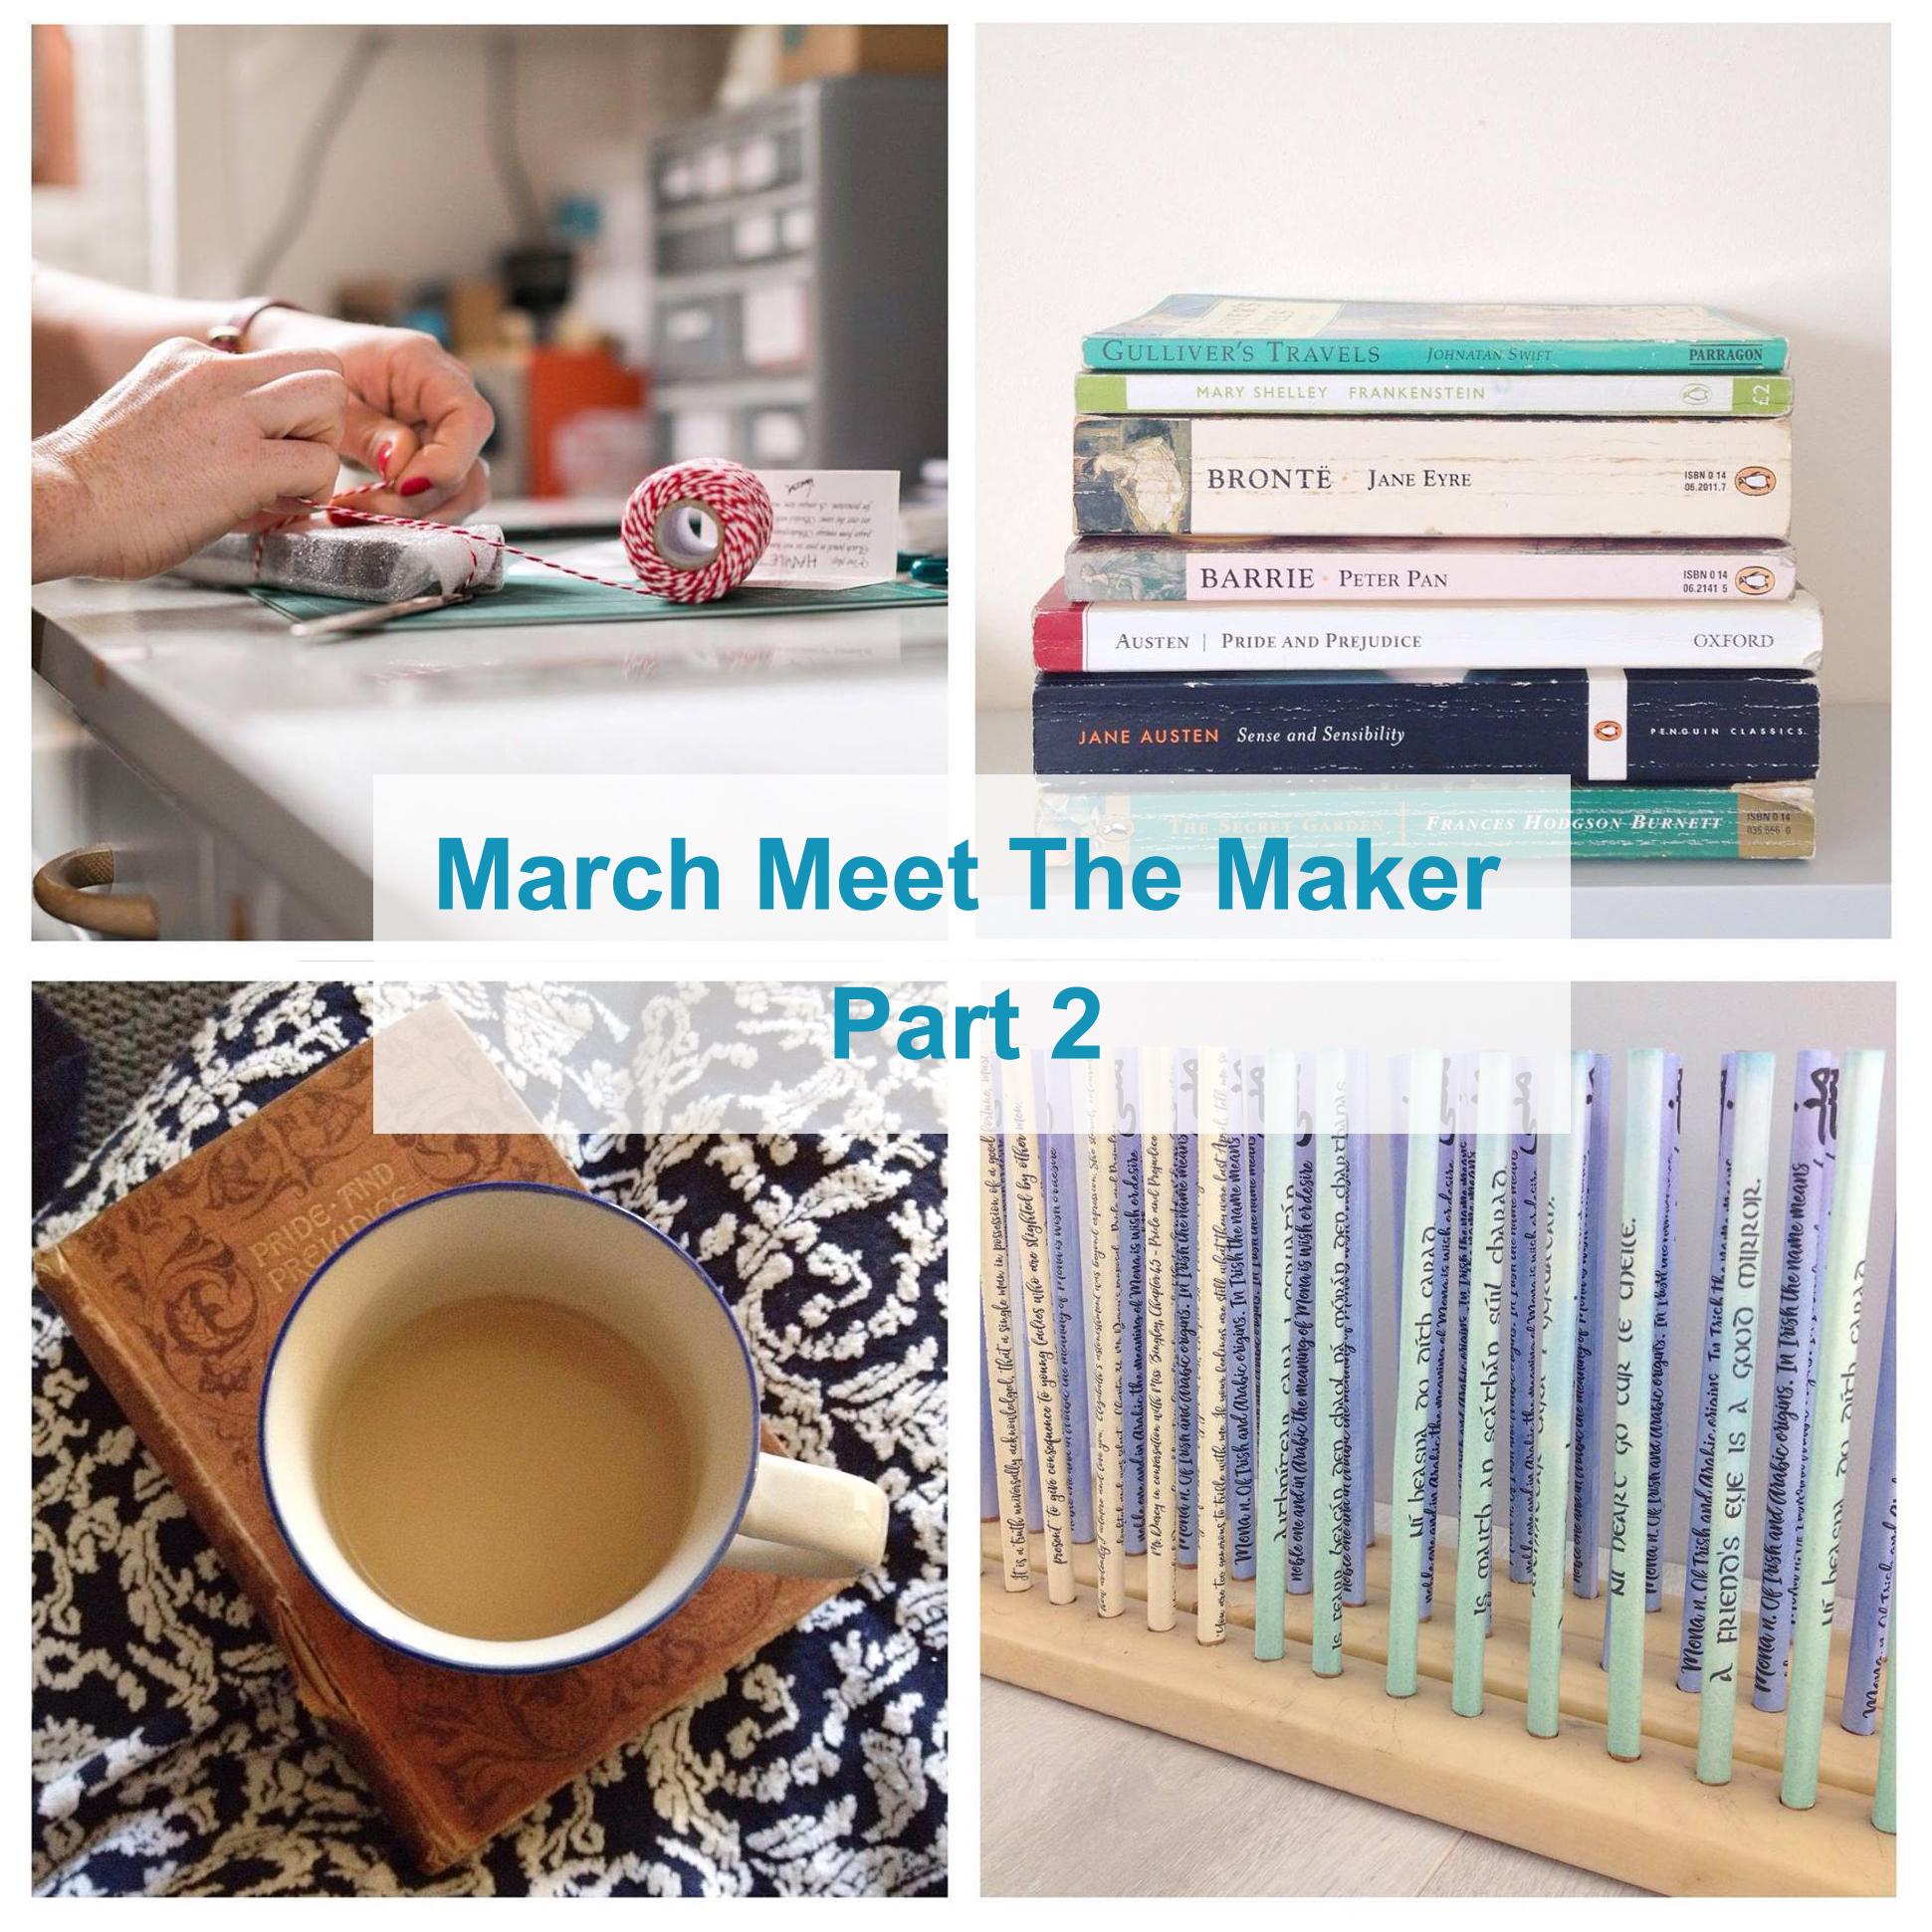 Meet the Maker: Part 2, behind the Scenes at six0six design